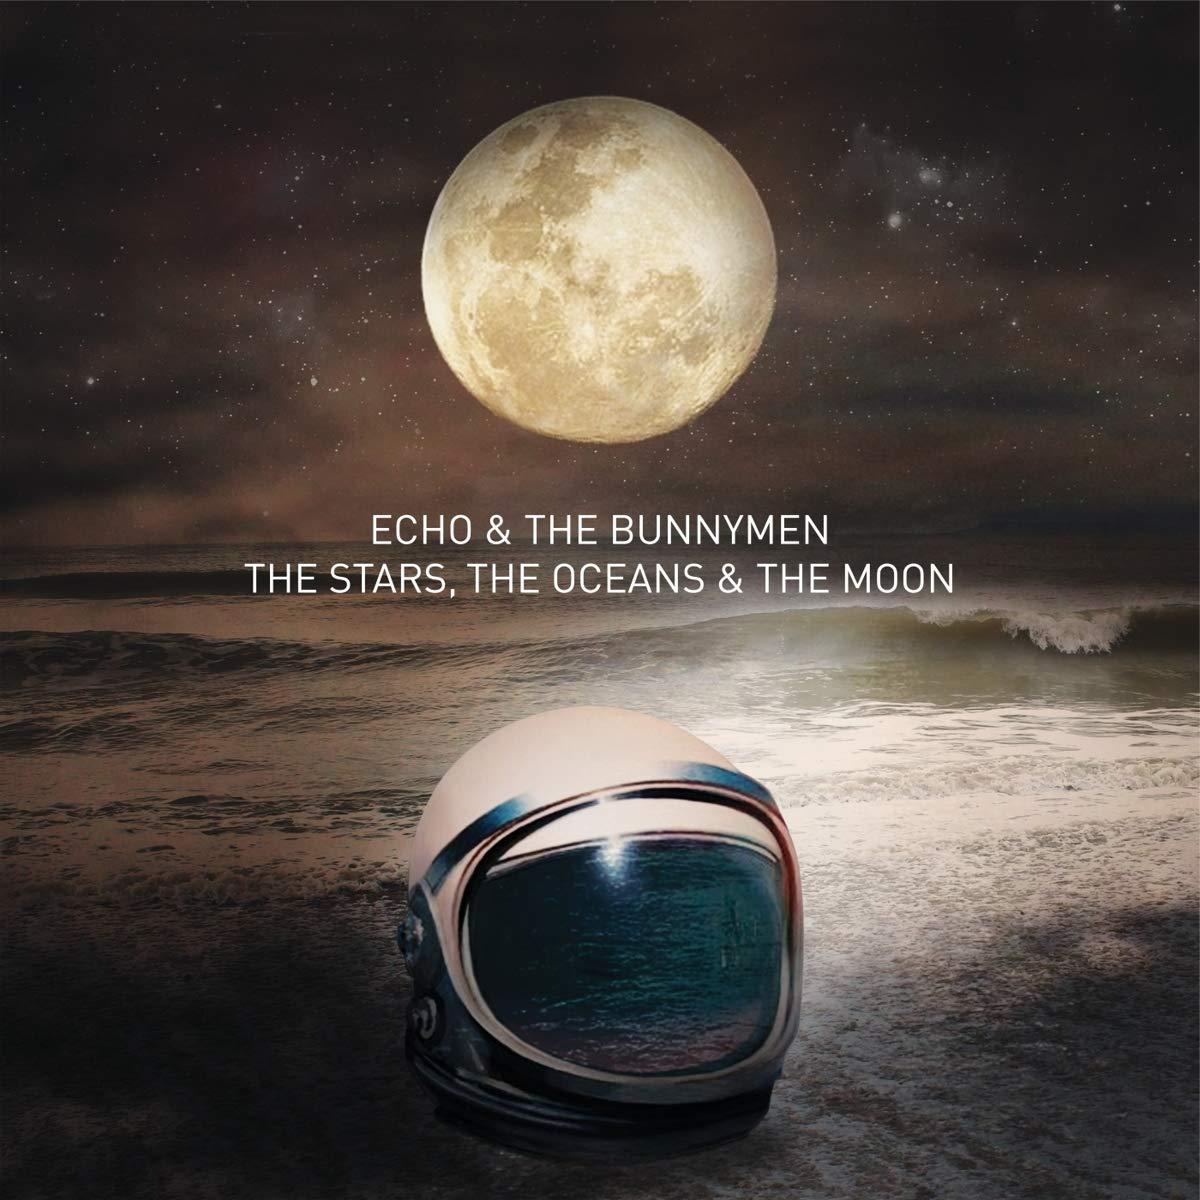 Cassette : Echo & Bunnymen - Stars The Oceans & The Moon (Cassette)